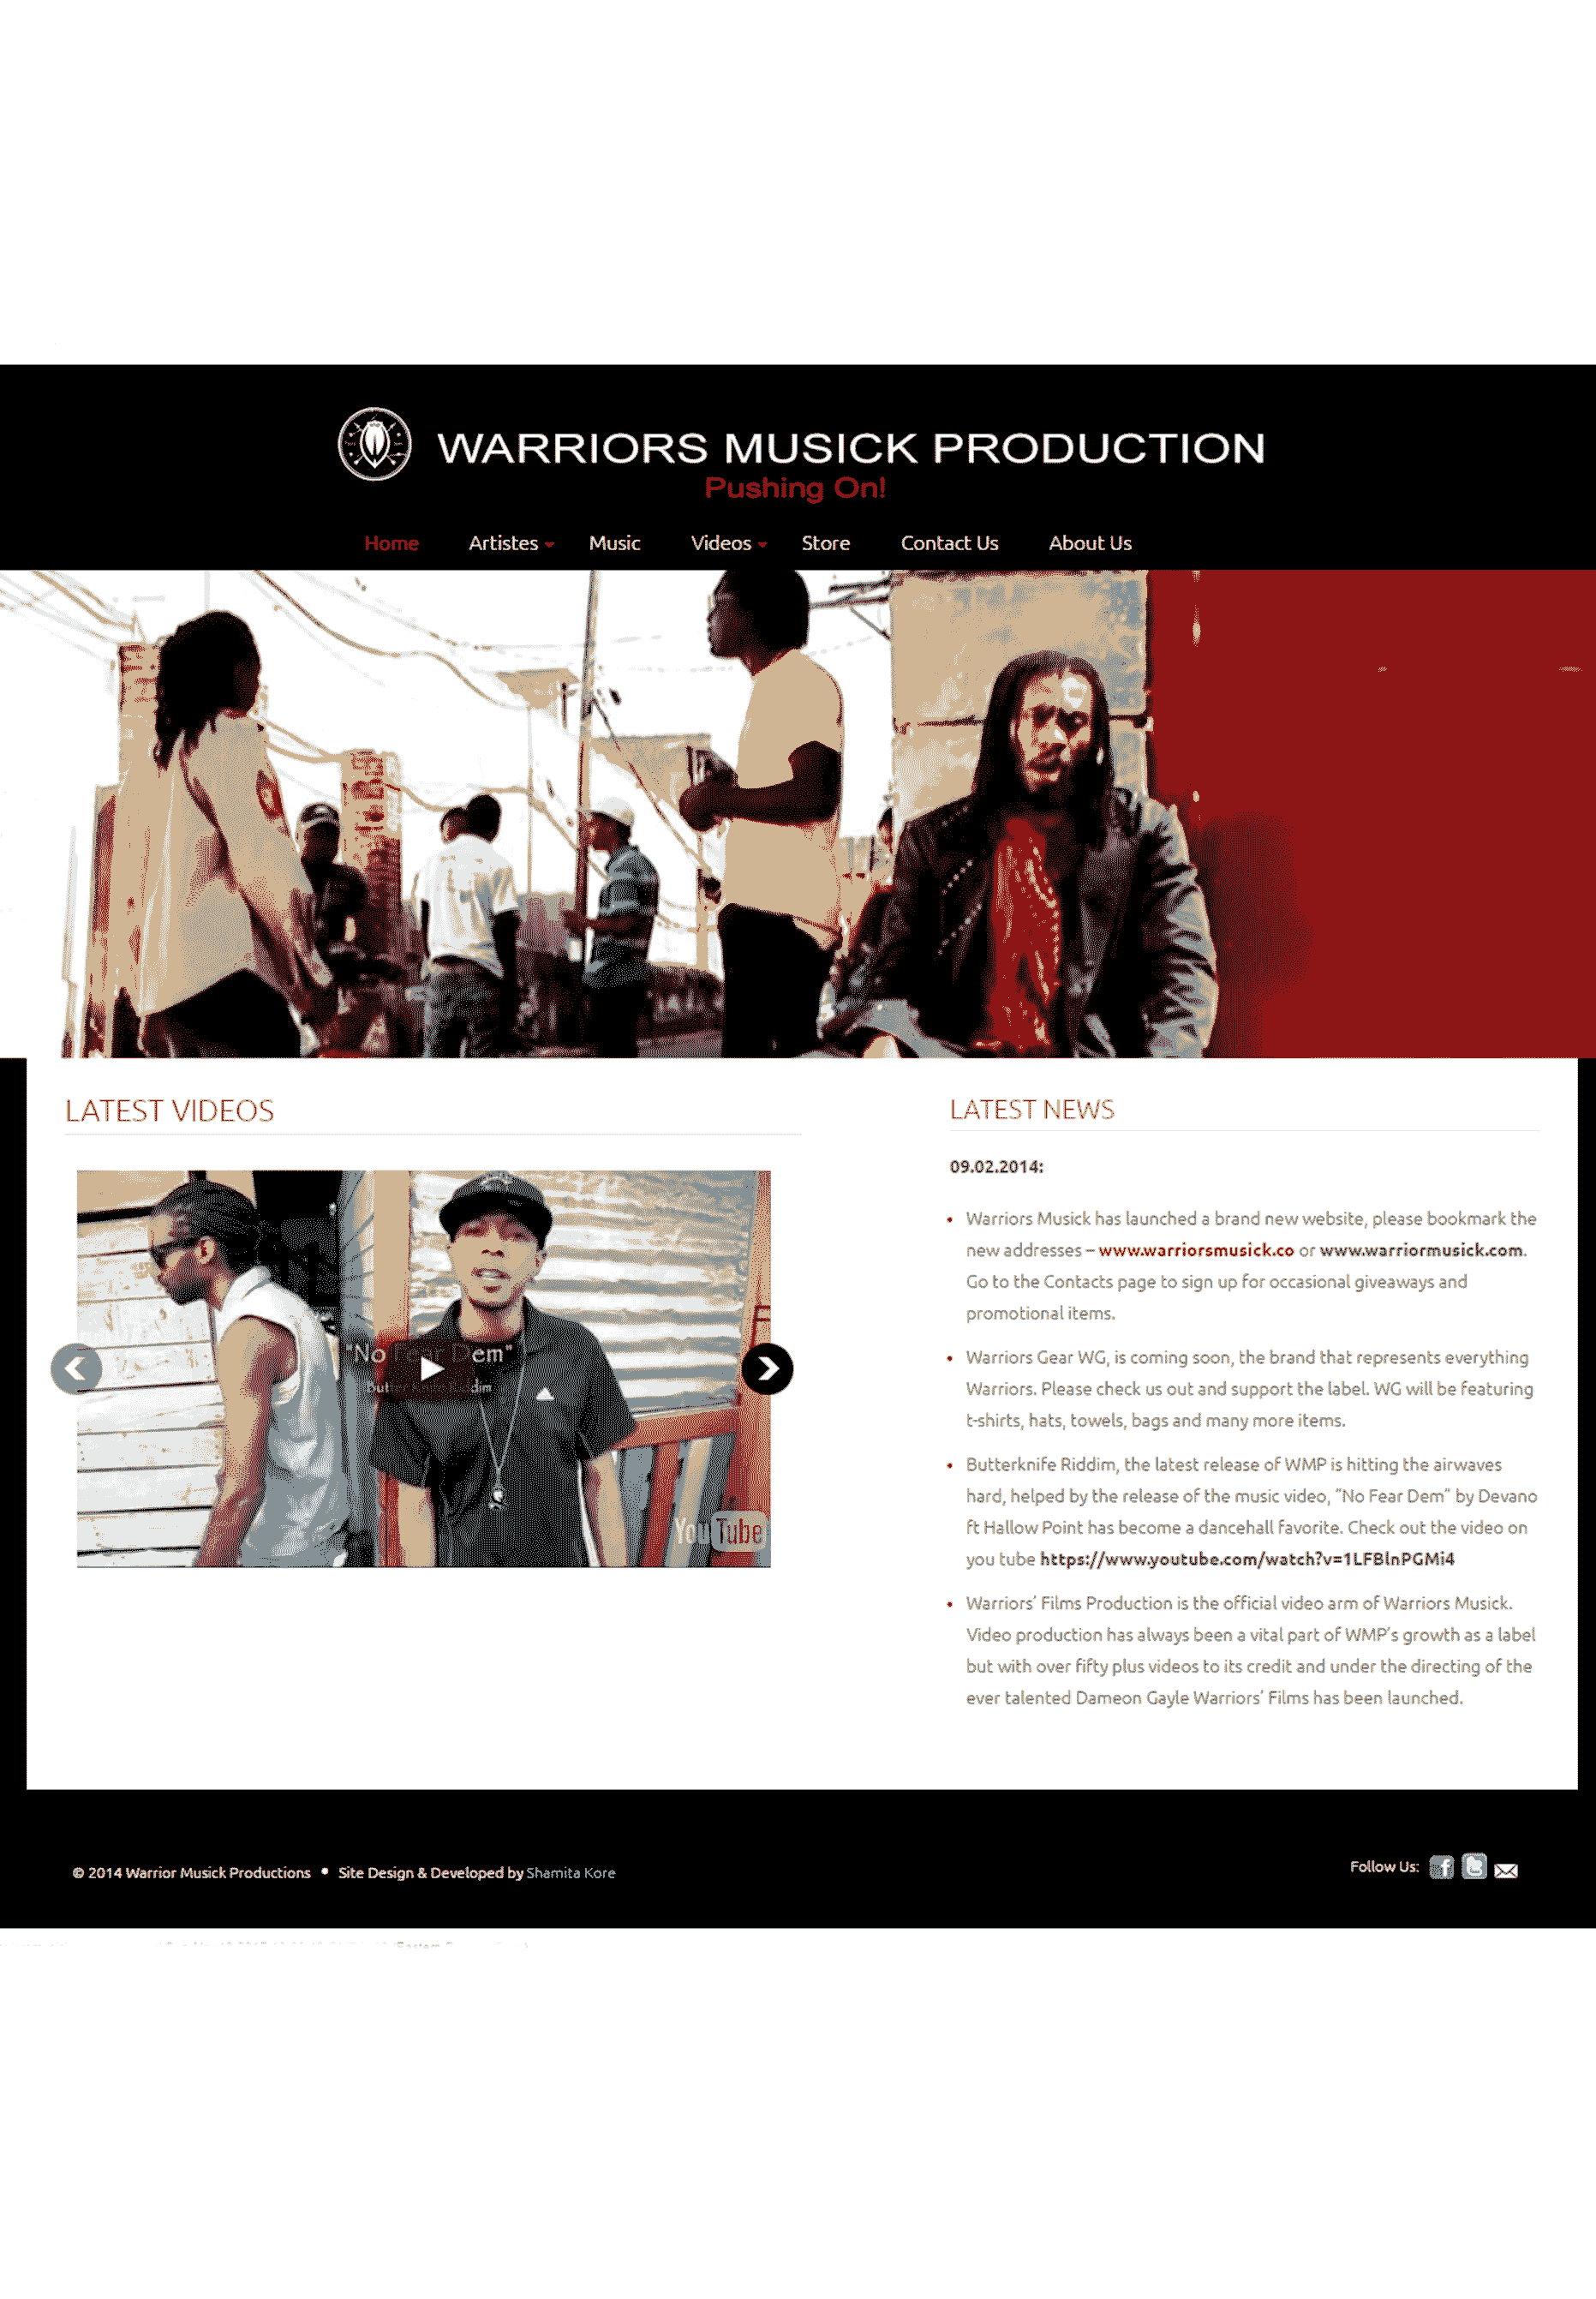 Next Step Digital Solutions Warrior Musick Page2